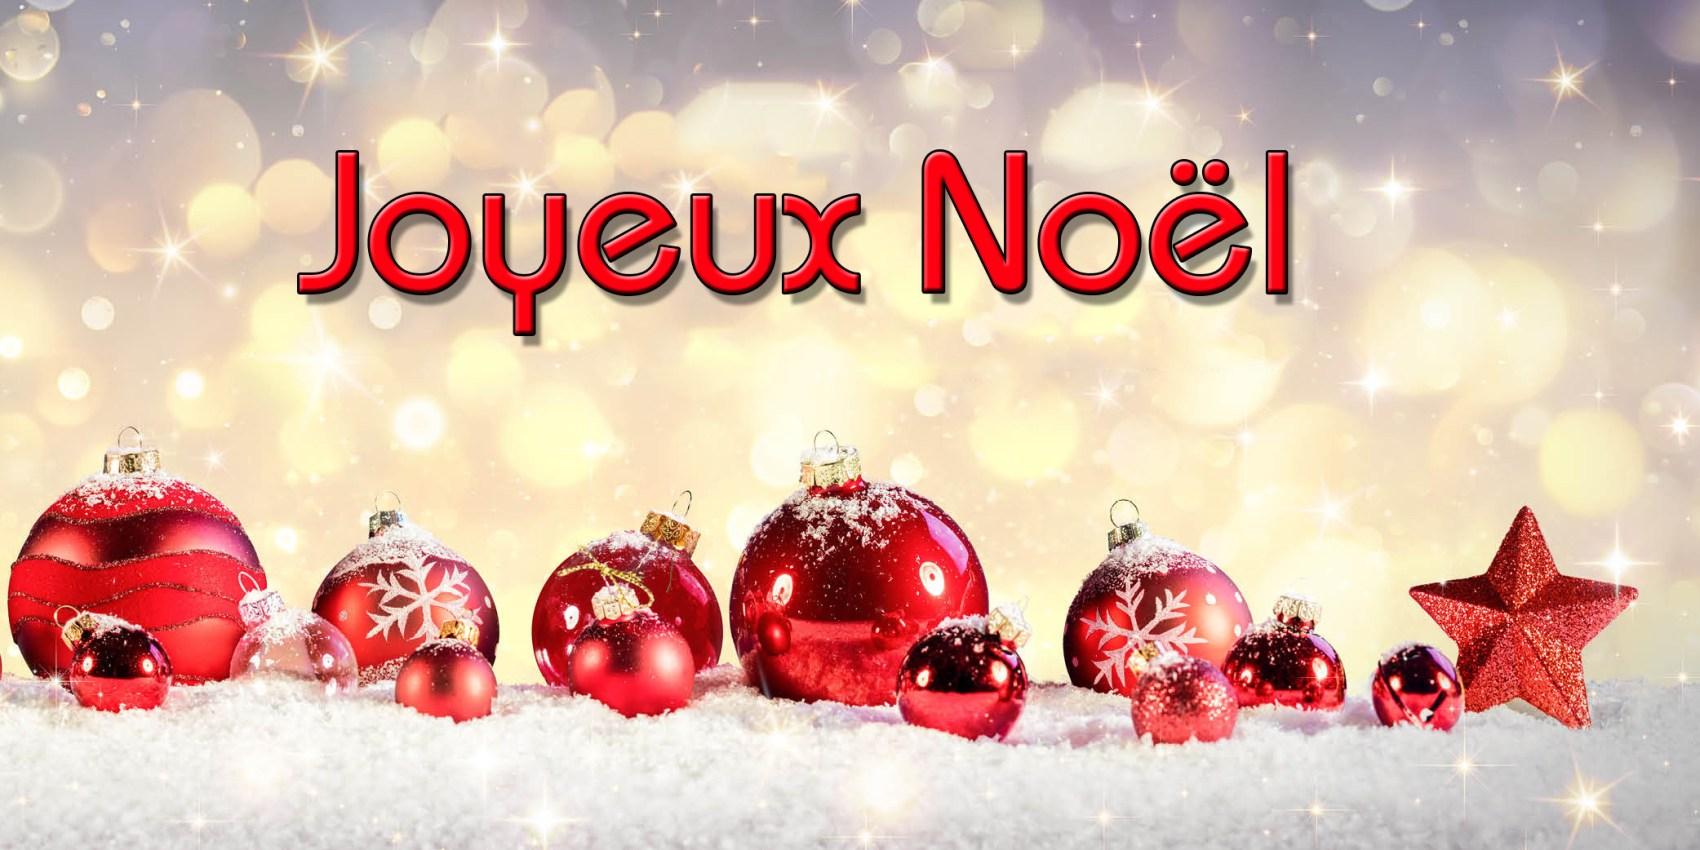 joyeux-noel-marche-de-noel-rouen-2018.jpg